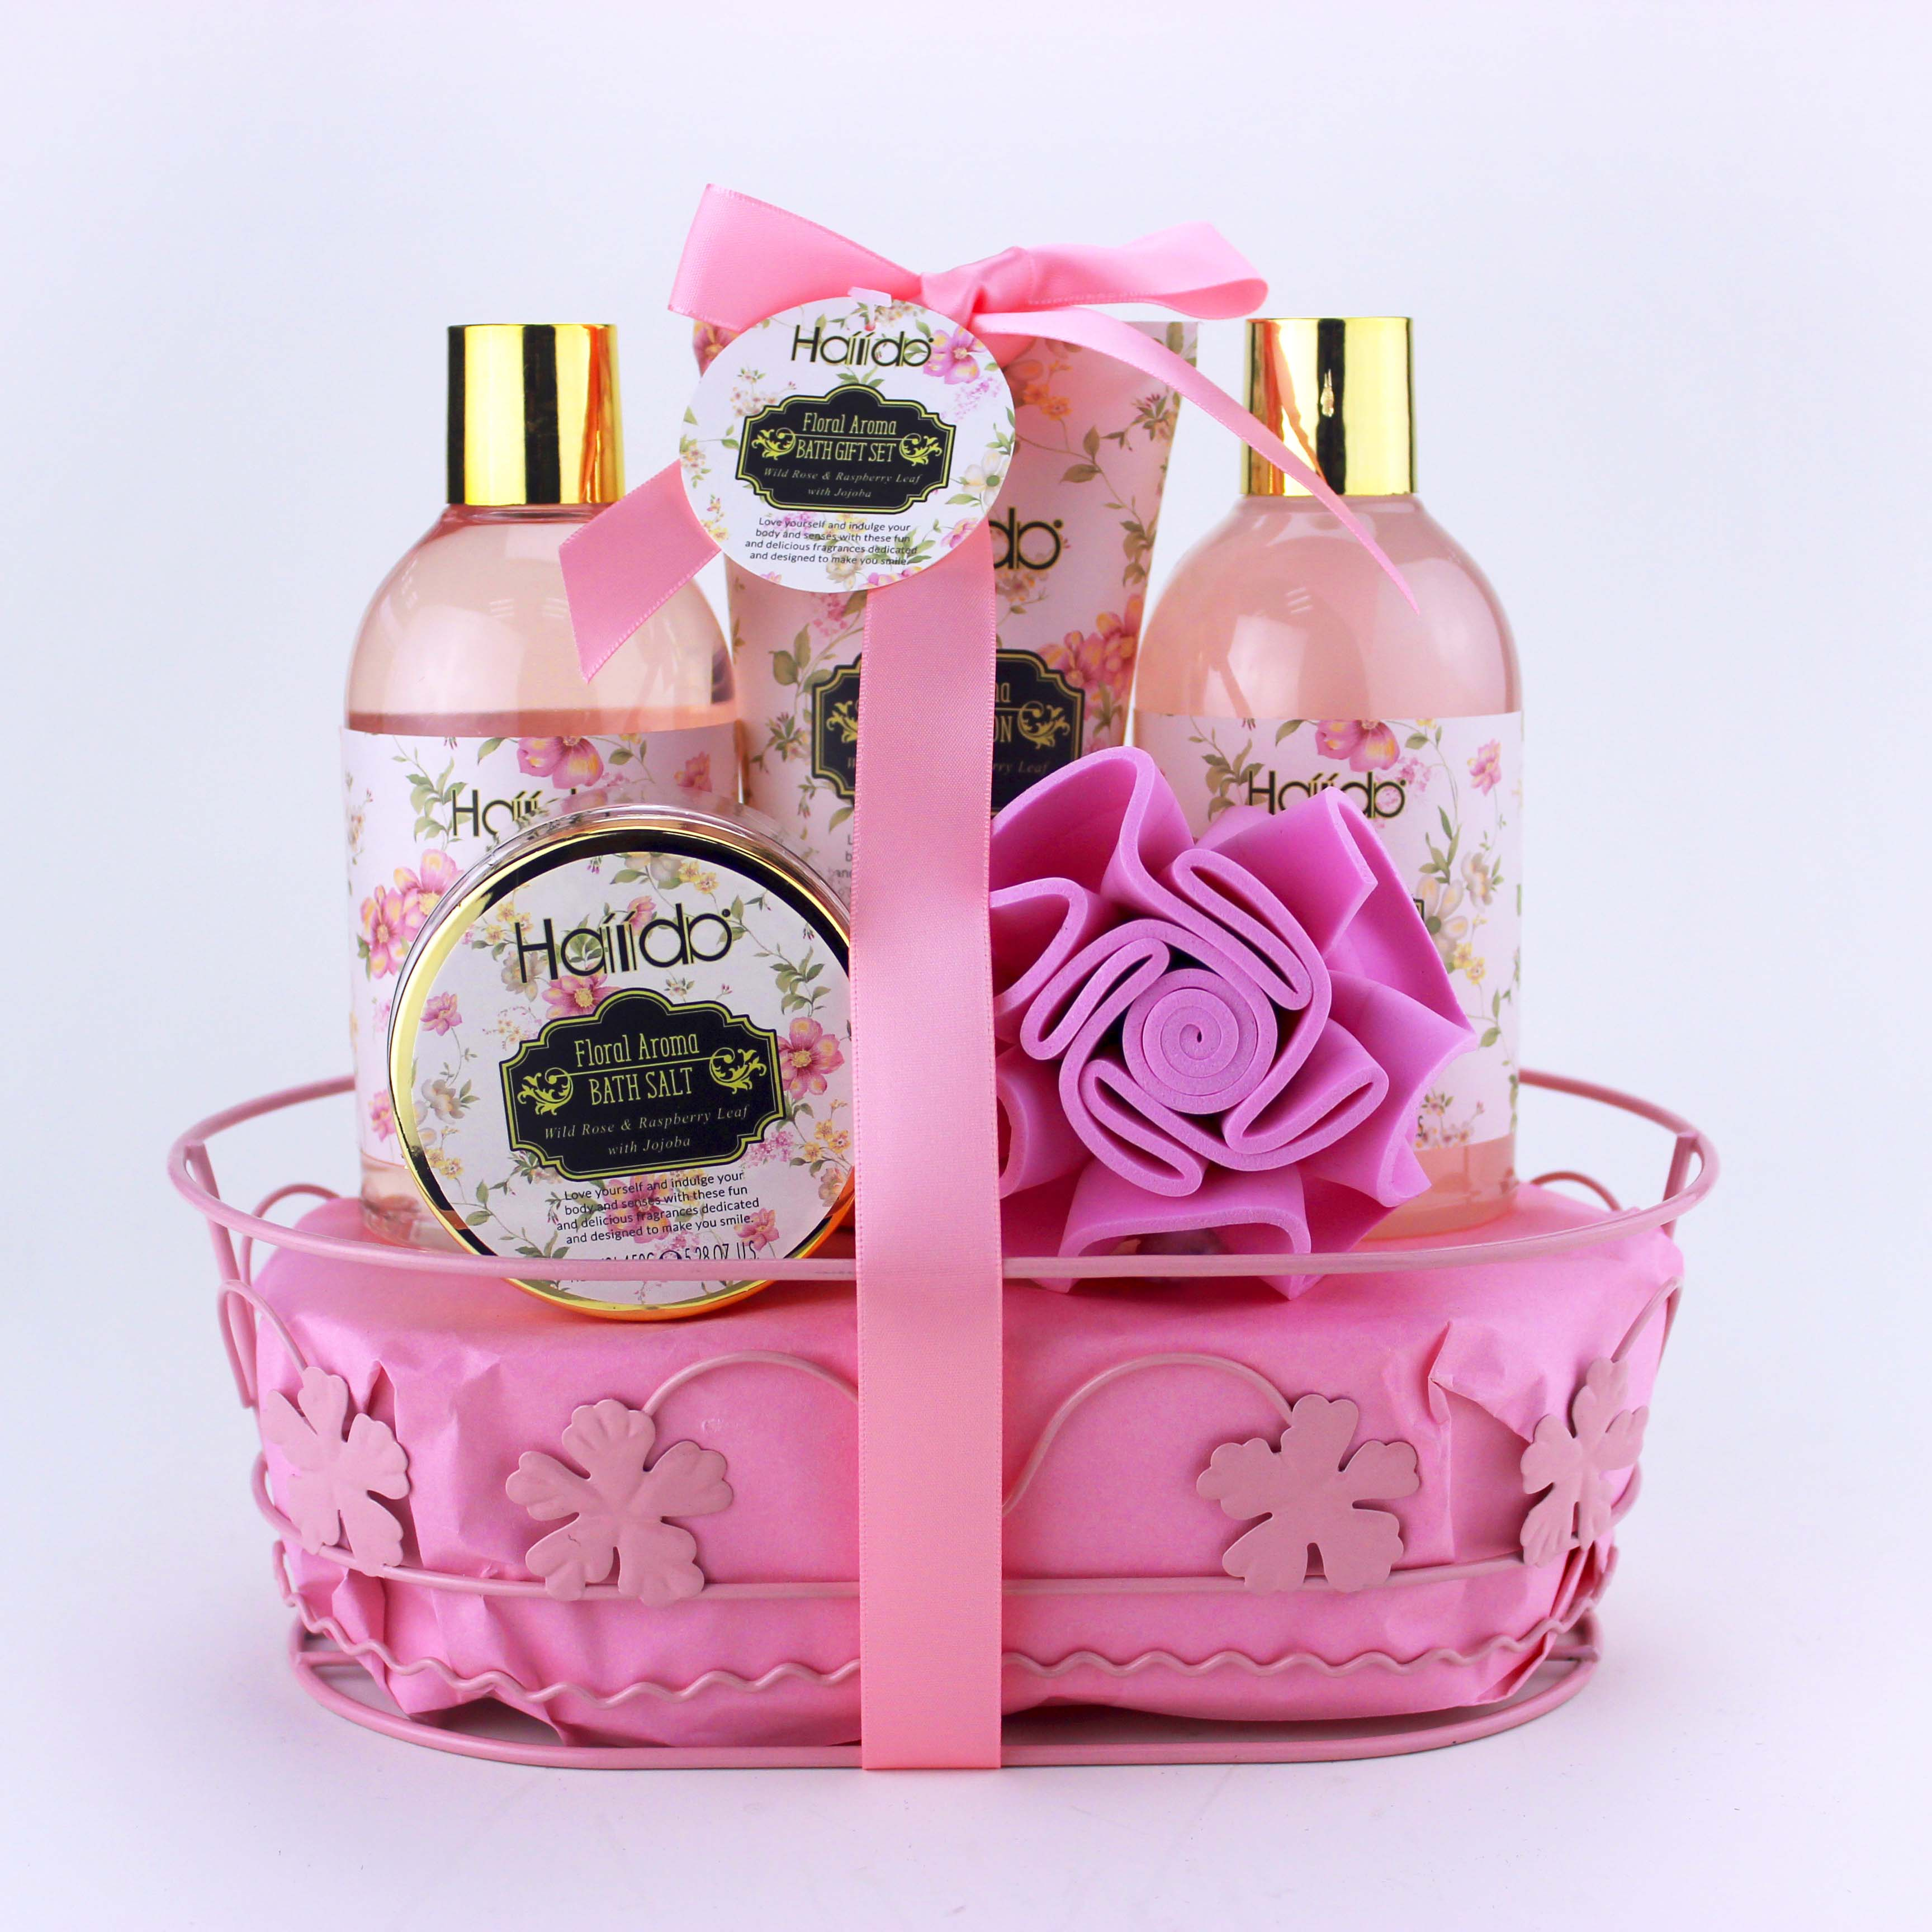 Festivals Women Promotion Valentine Roes Bath Spa Knit Gift Set OEM